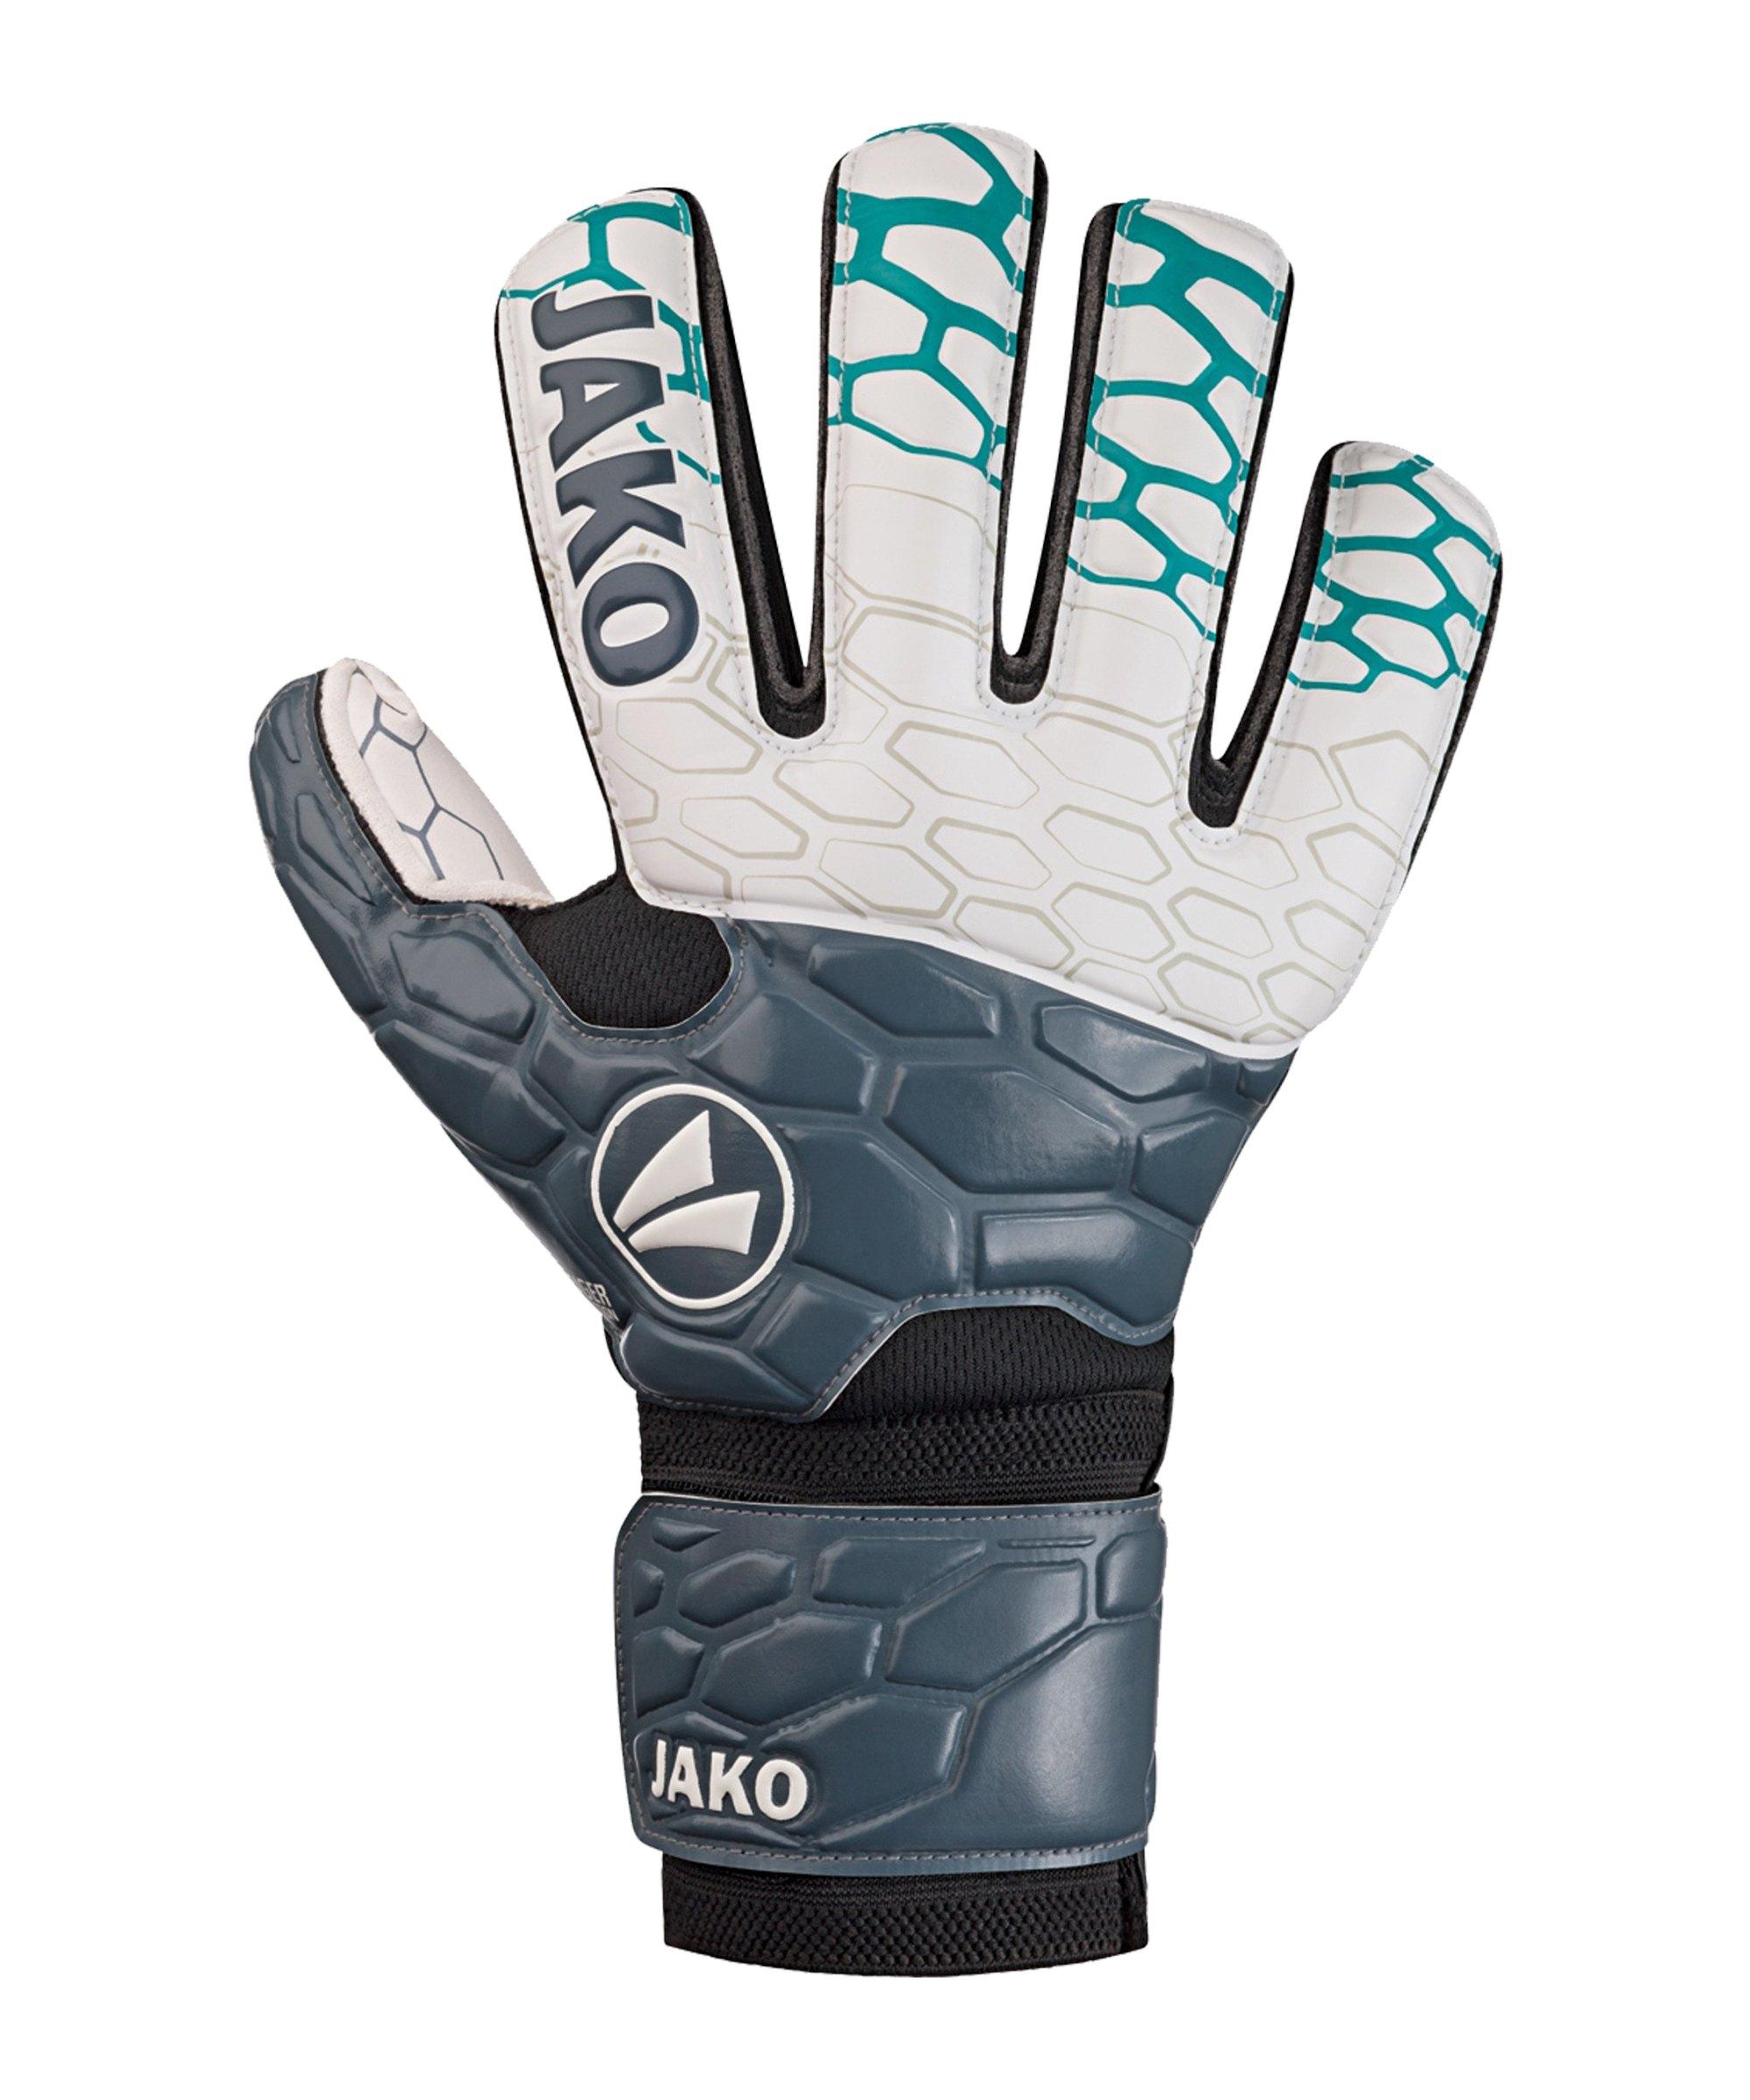 JAKO TW-Handschuh Prestige Basic RC Protection F24 - grau